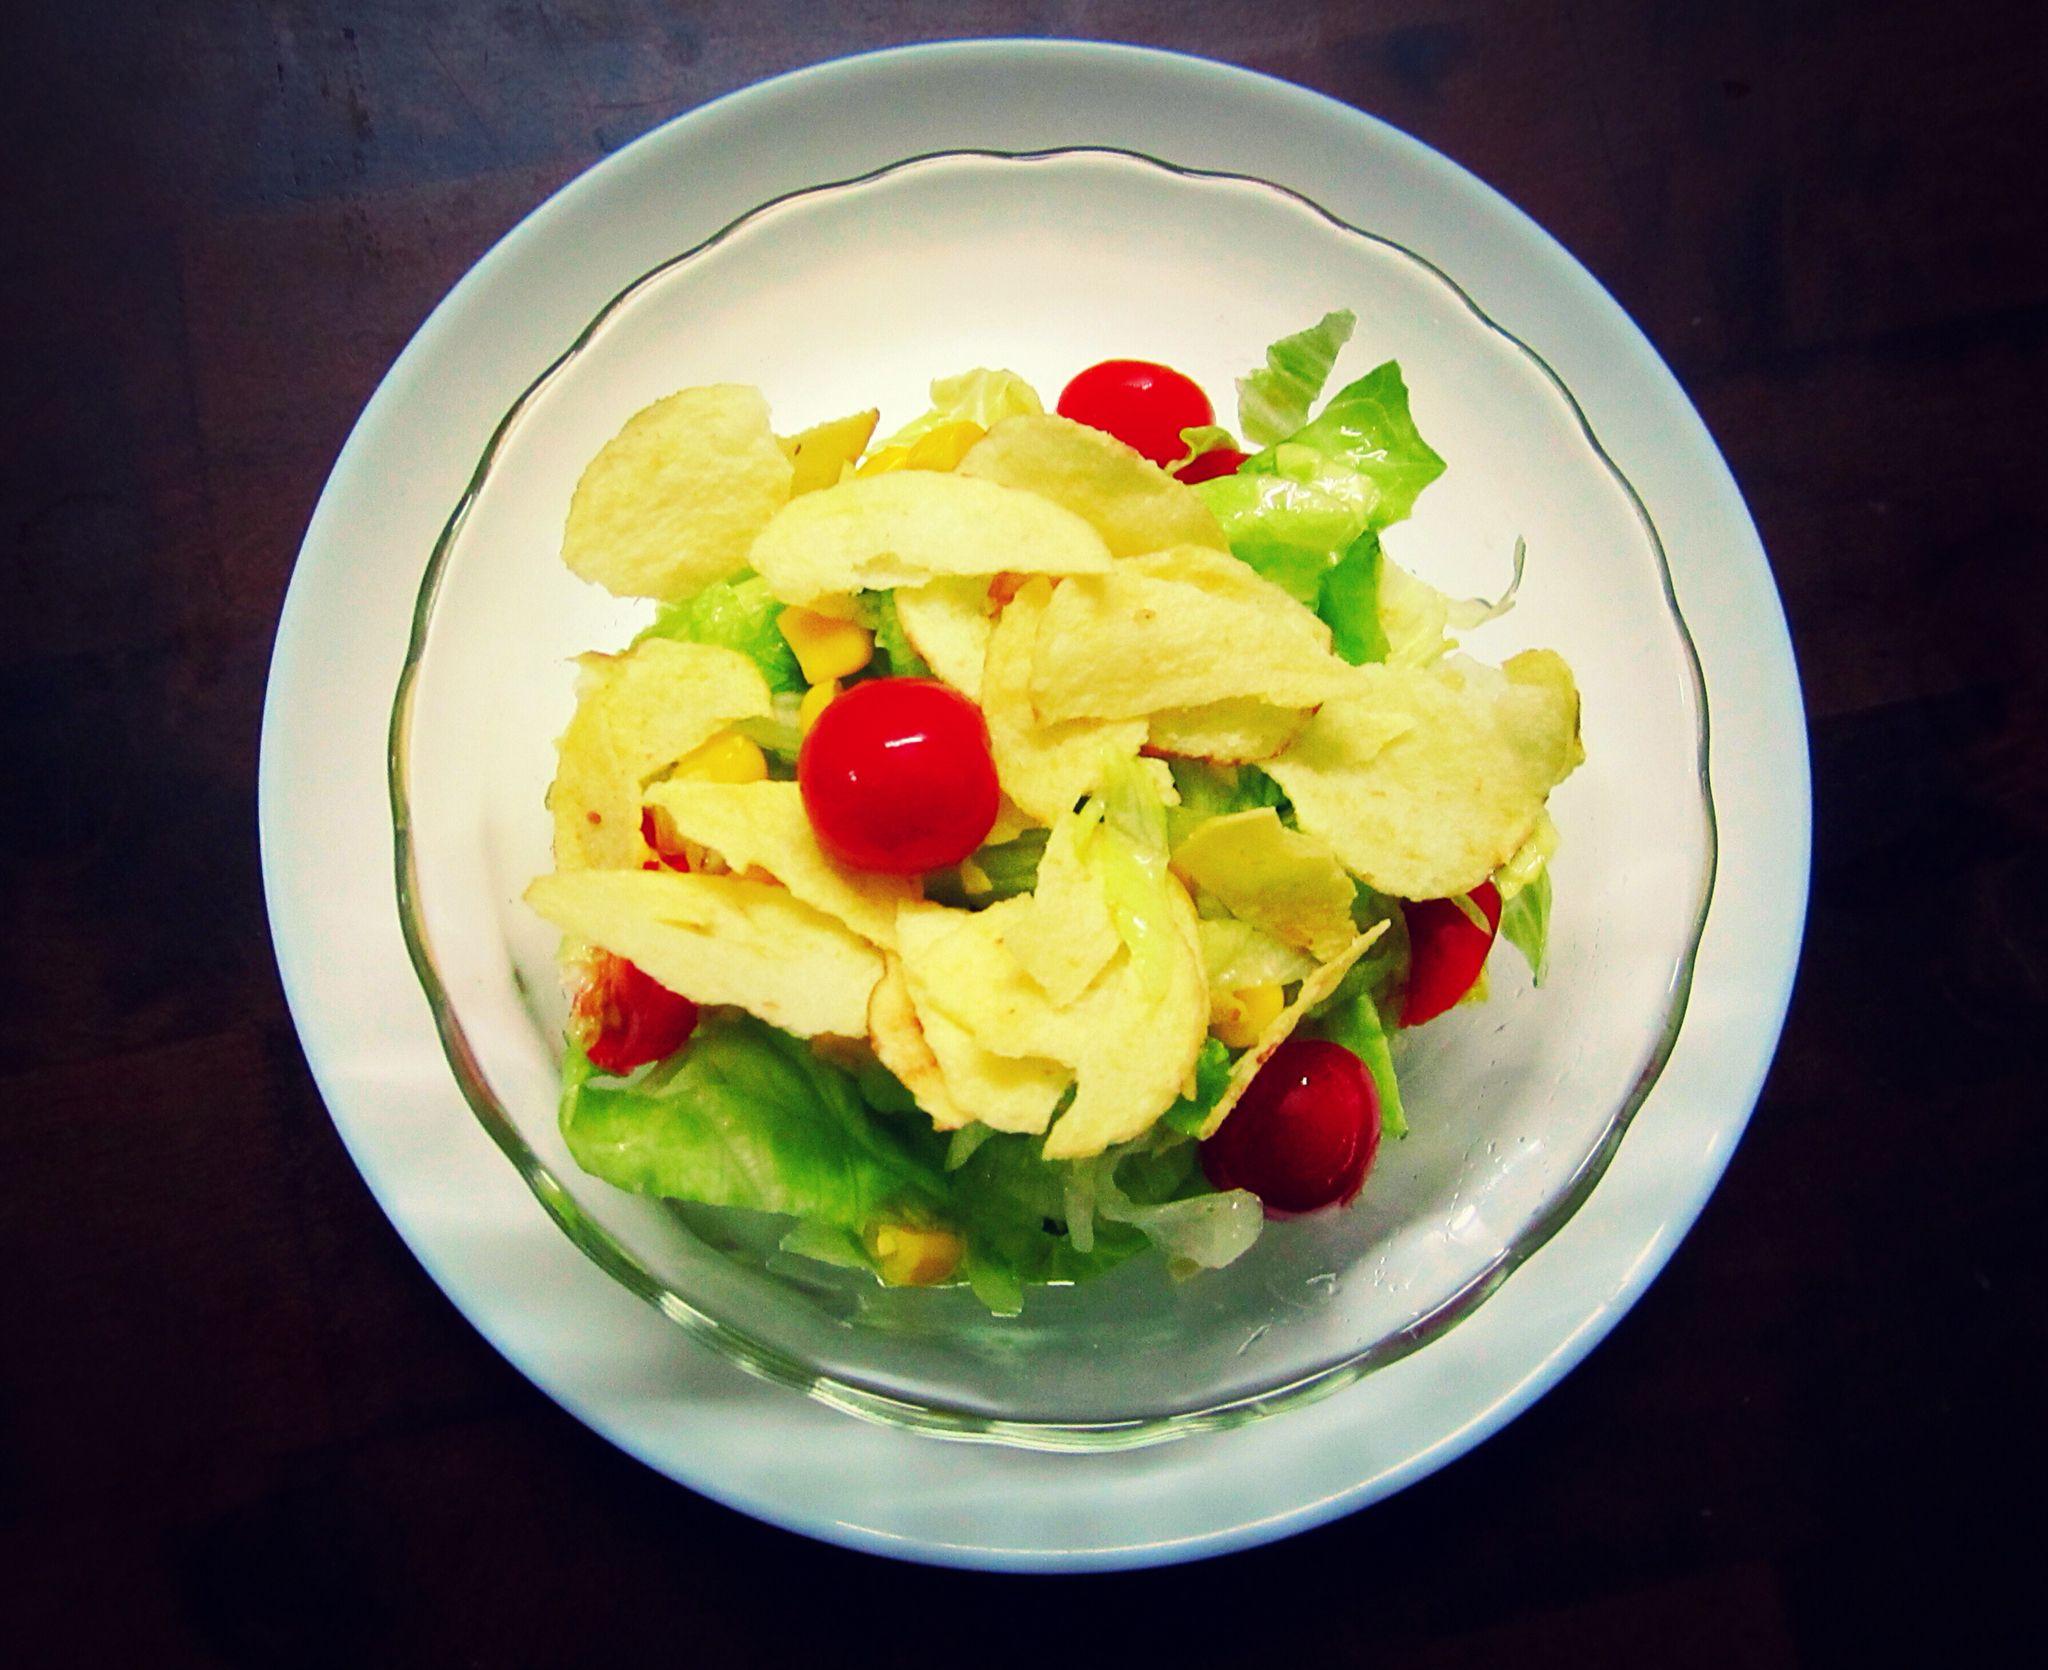 Corn and iceberg lettuce salad | Lettuce salad, Delicious ...